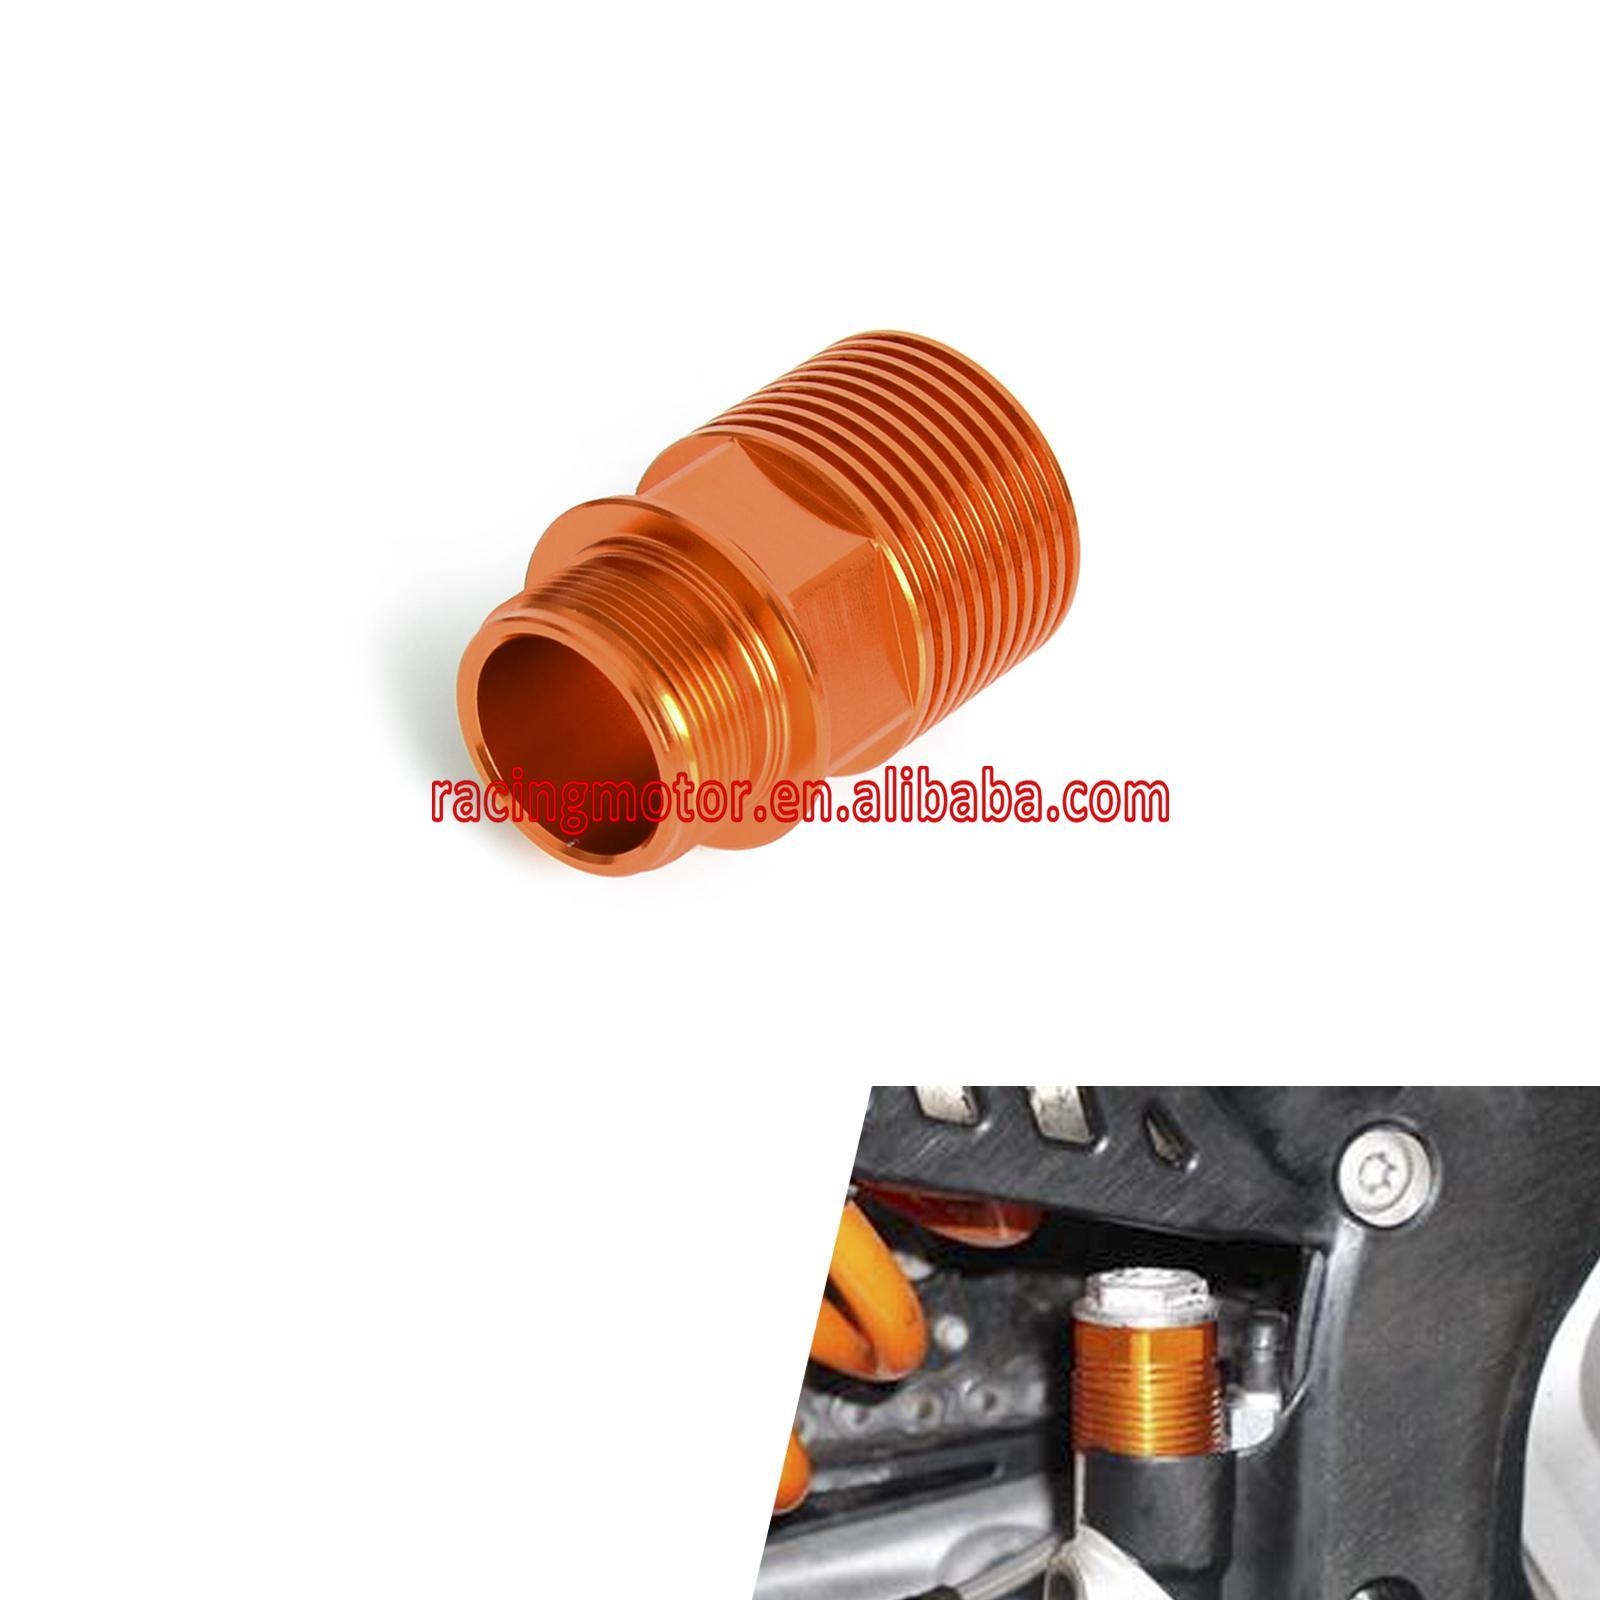 ▽Freno trasero extender para KTM 125 250 300 450 500 525 530 SX SX